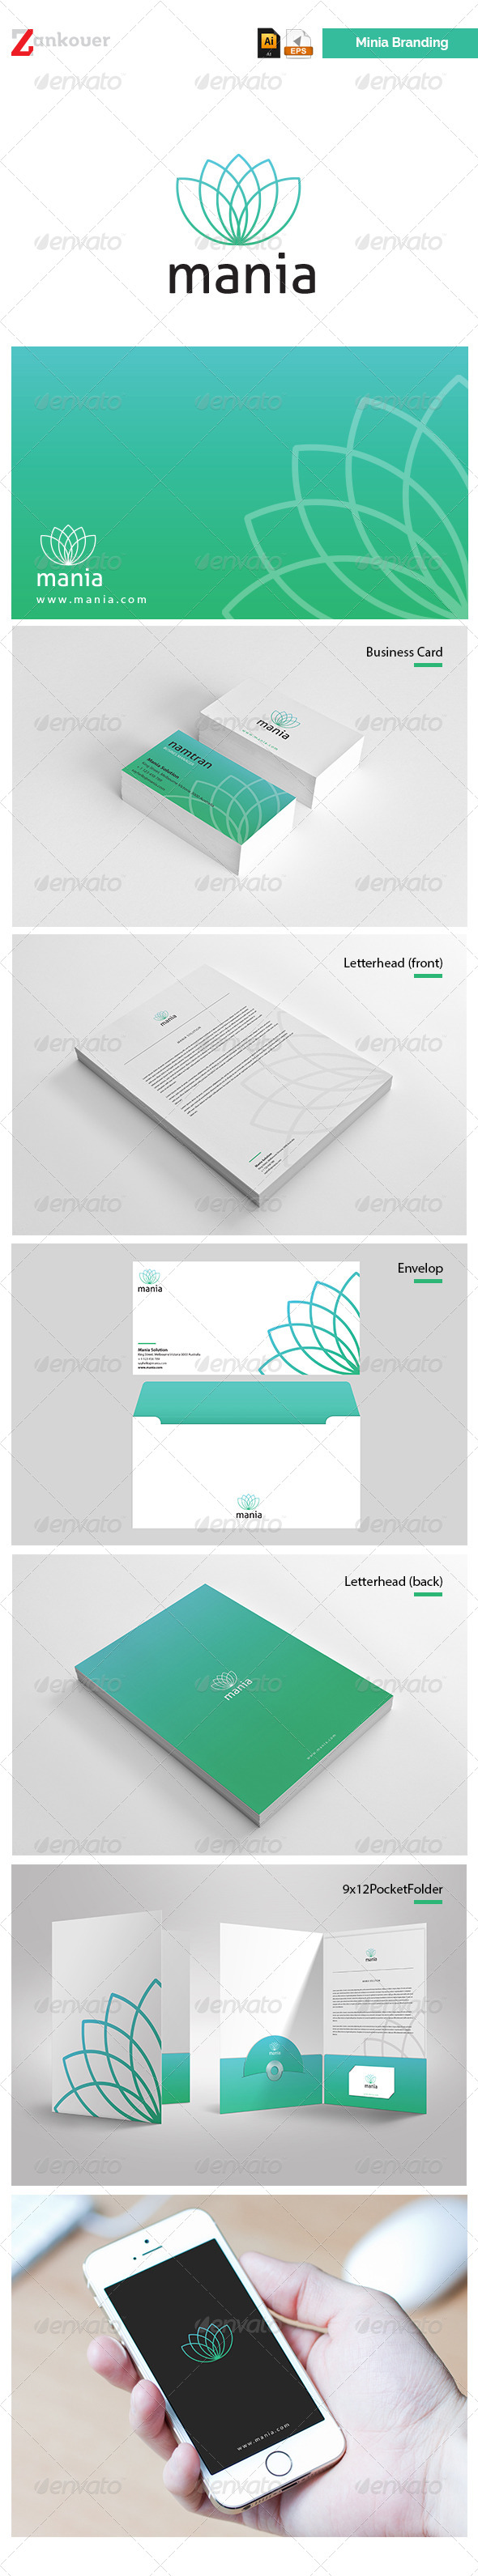 GraphicRiver Stationary & Brand Identity Mania 6435853